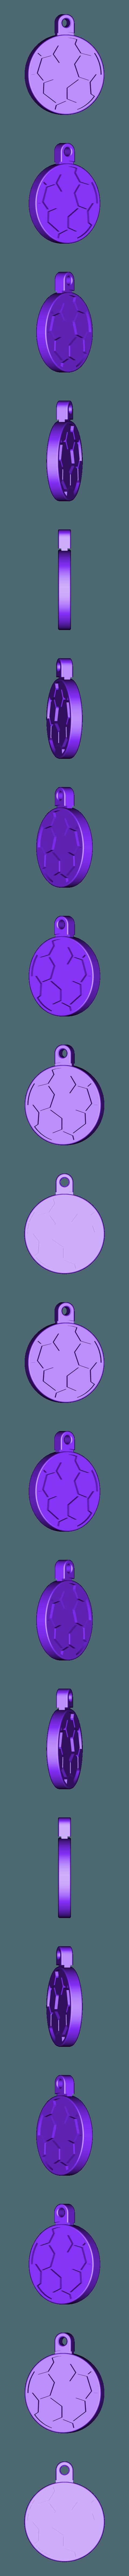 soccer_fob.stl Download free STL file Soccer Ball / Football Key Fob • 3D printable design, Muzz64